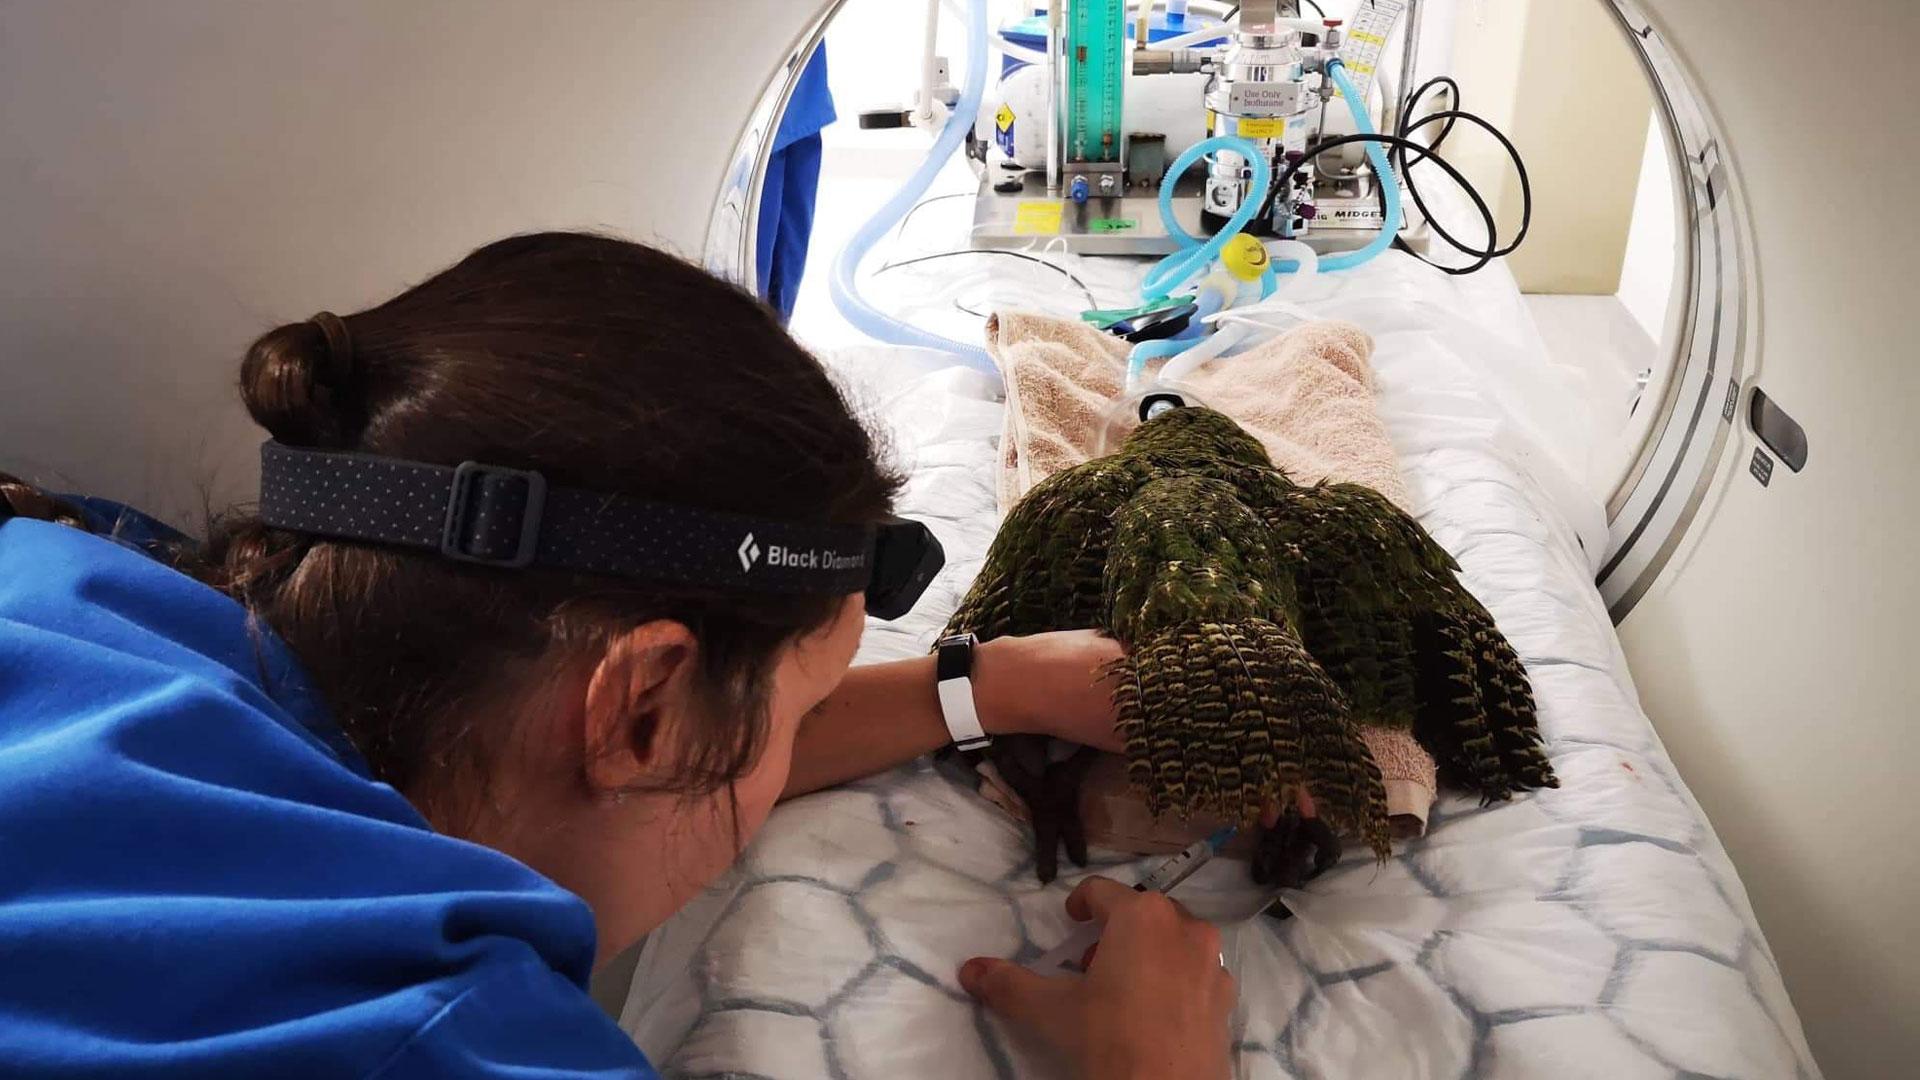 https://rfacdn.nz/zoo/assets/media/kakapo-gallery-4.jpg